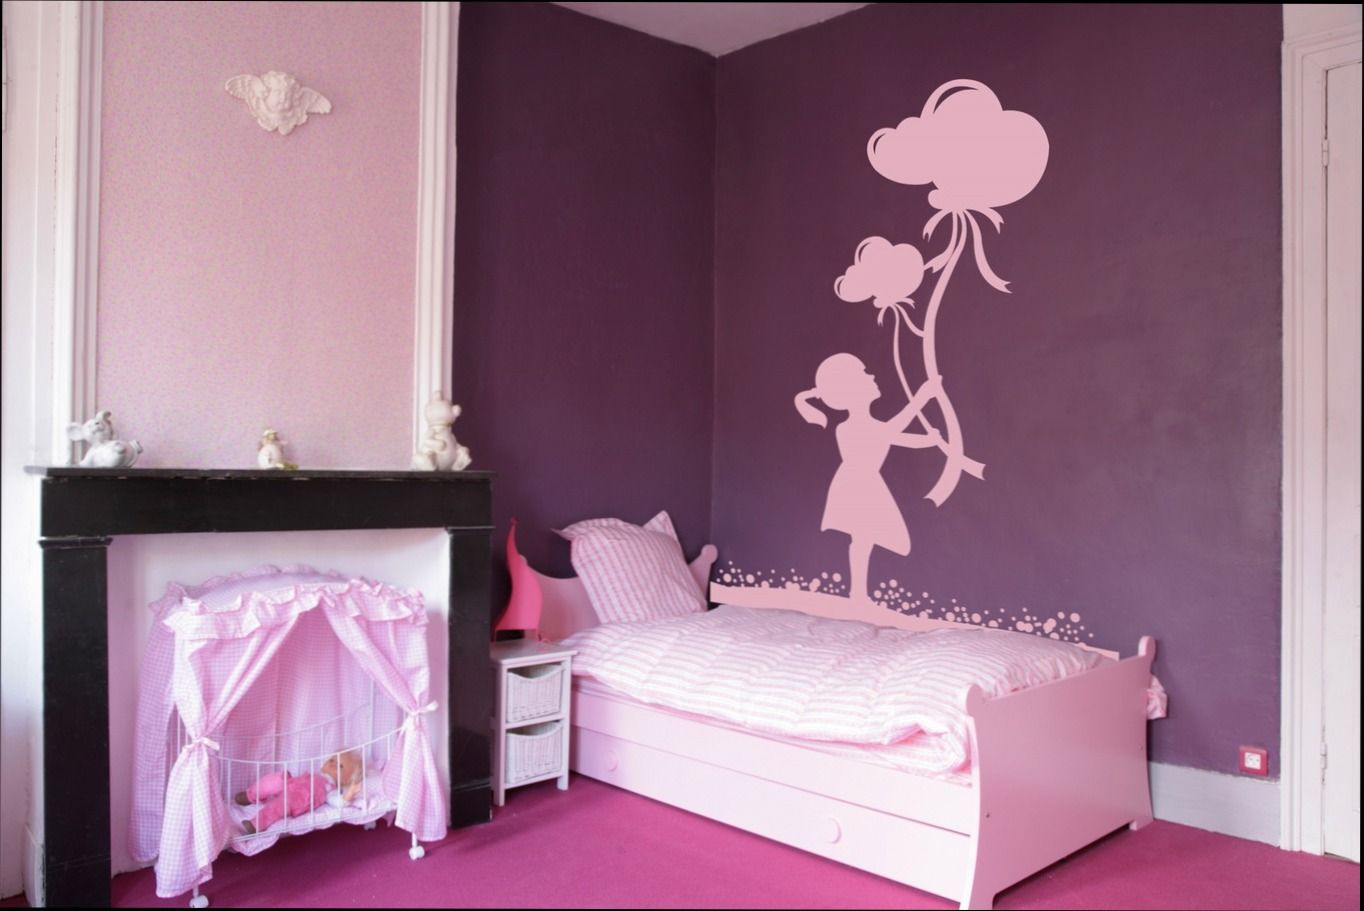 chambre filles 10 ans | Chambre Fille : chambre fille 10 ans ikea ...